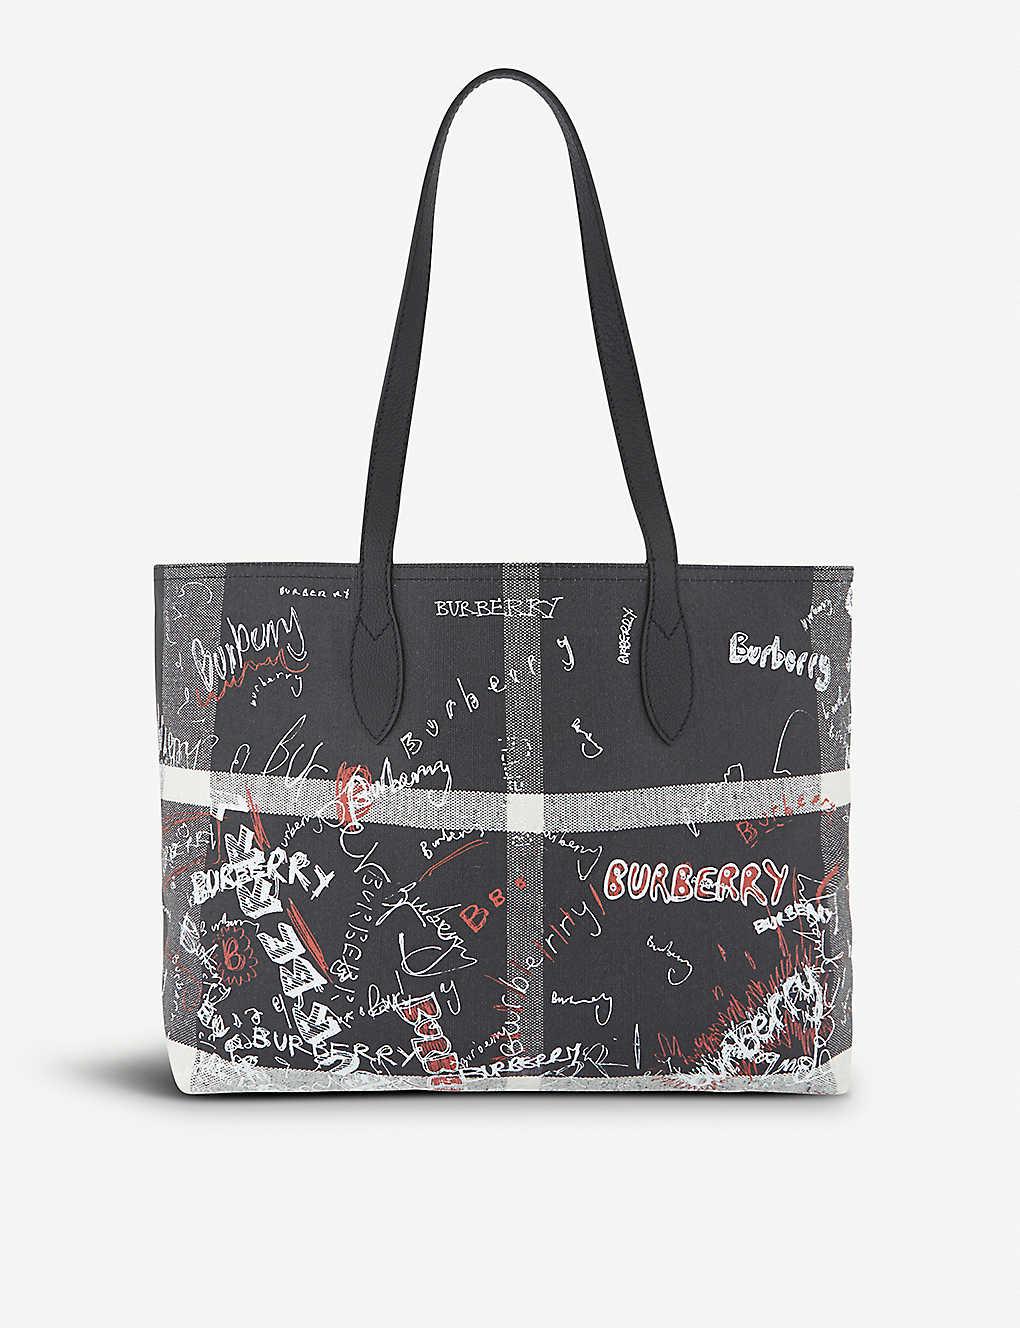 Burberry Bags Women